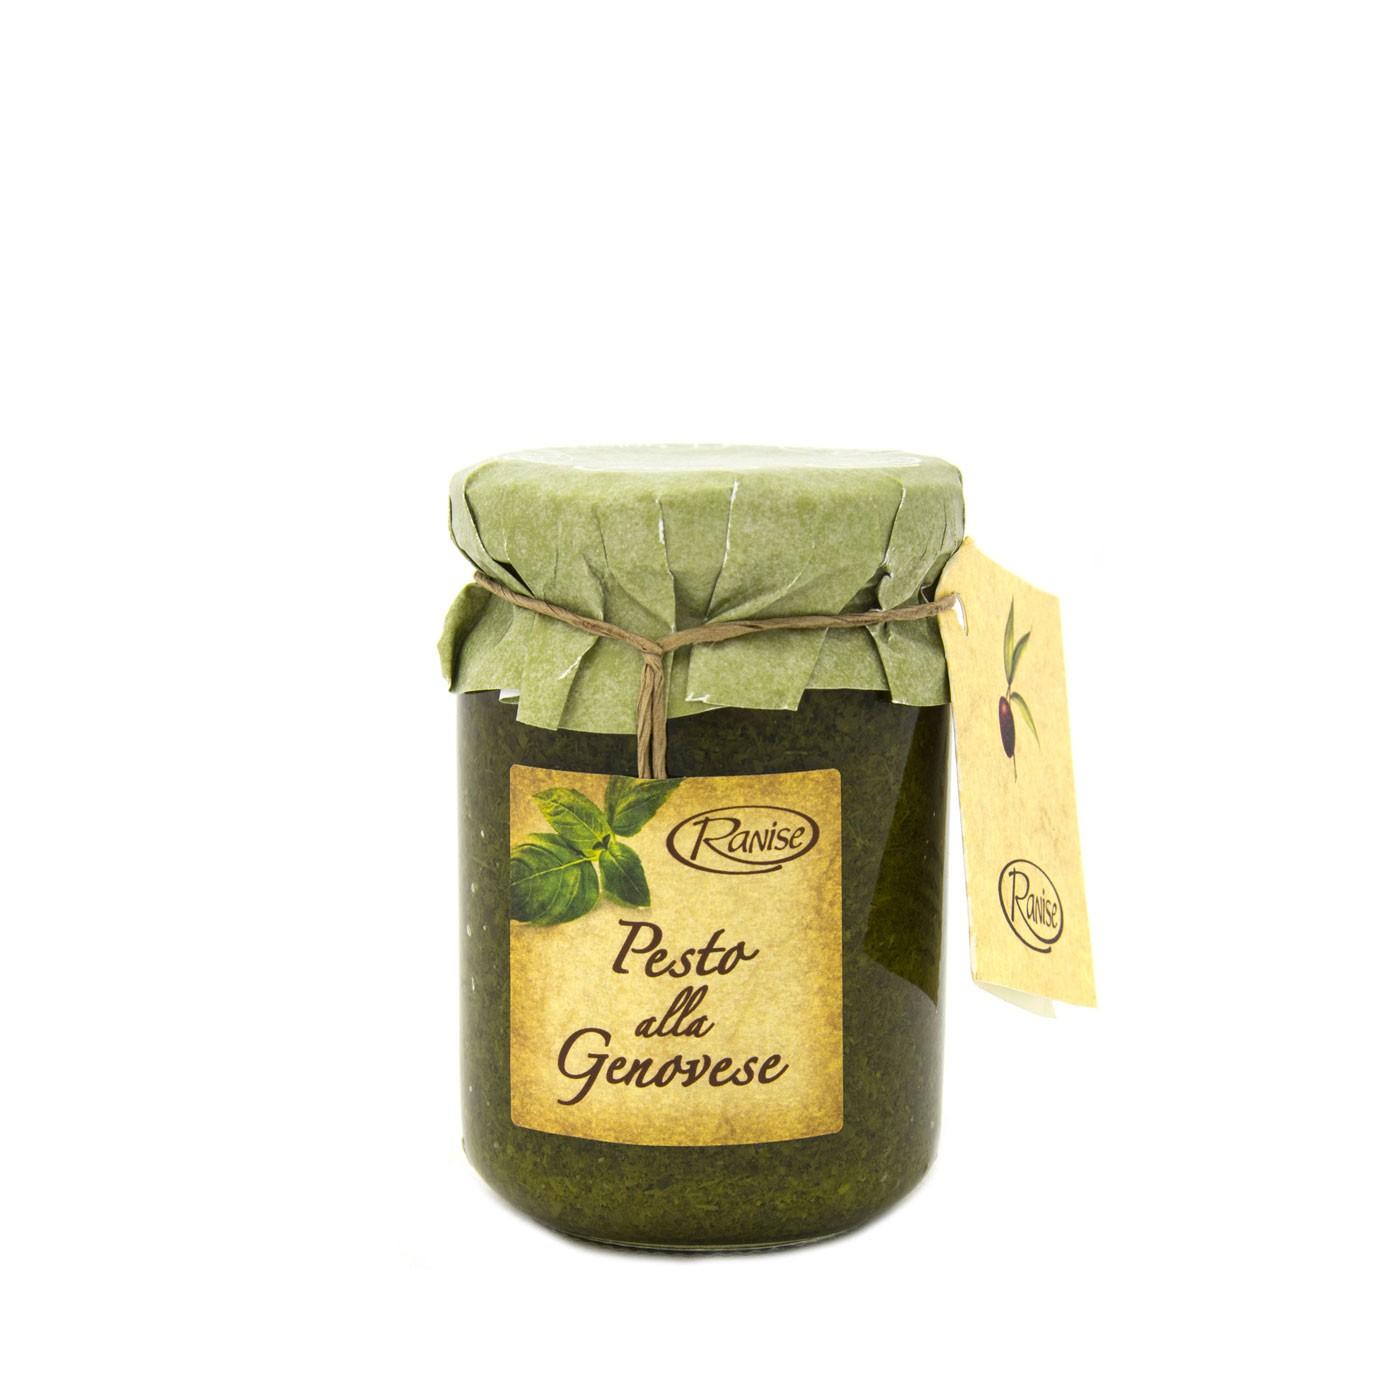 Ligurian Pesto 4.59 oz